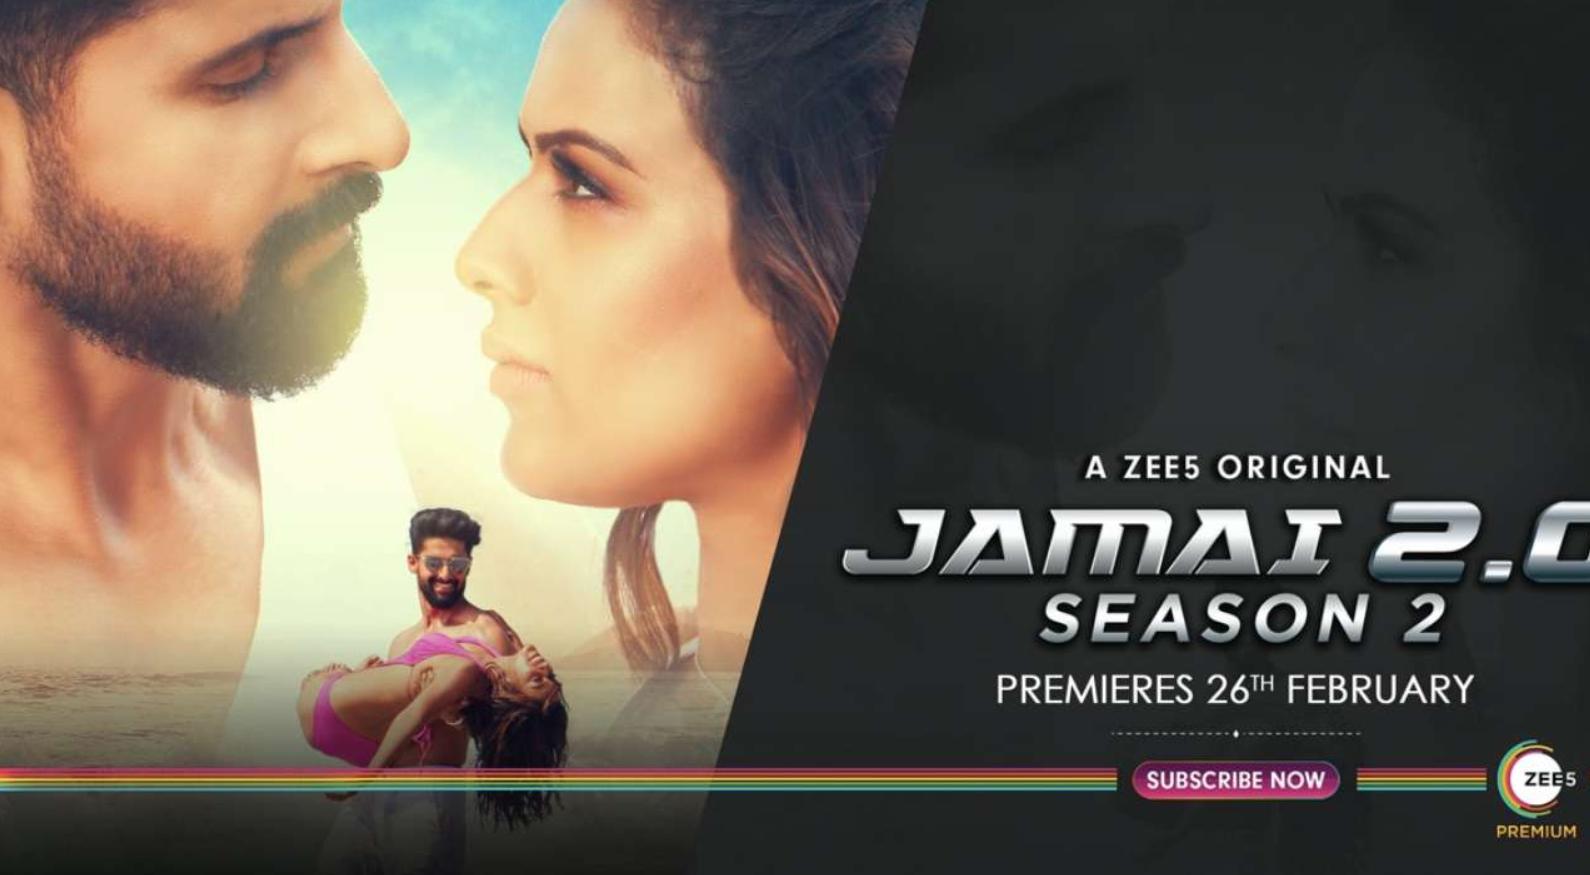 Jamai Raja season 2: Nia Sharma and Ravi Dubey are back with their sizzling chemistry in Jamai 2.0